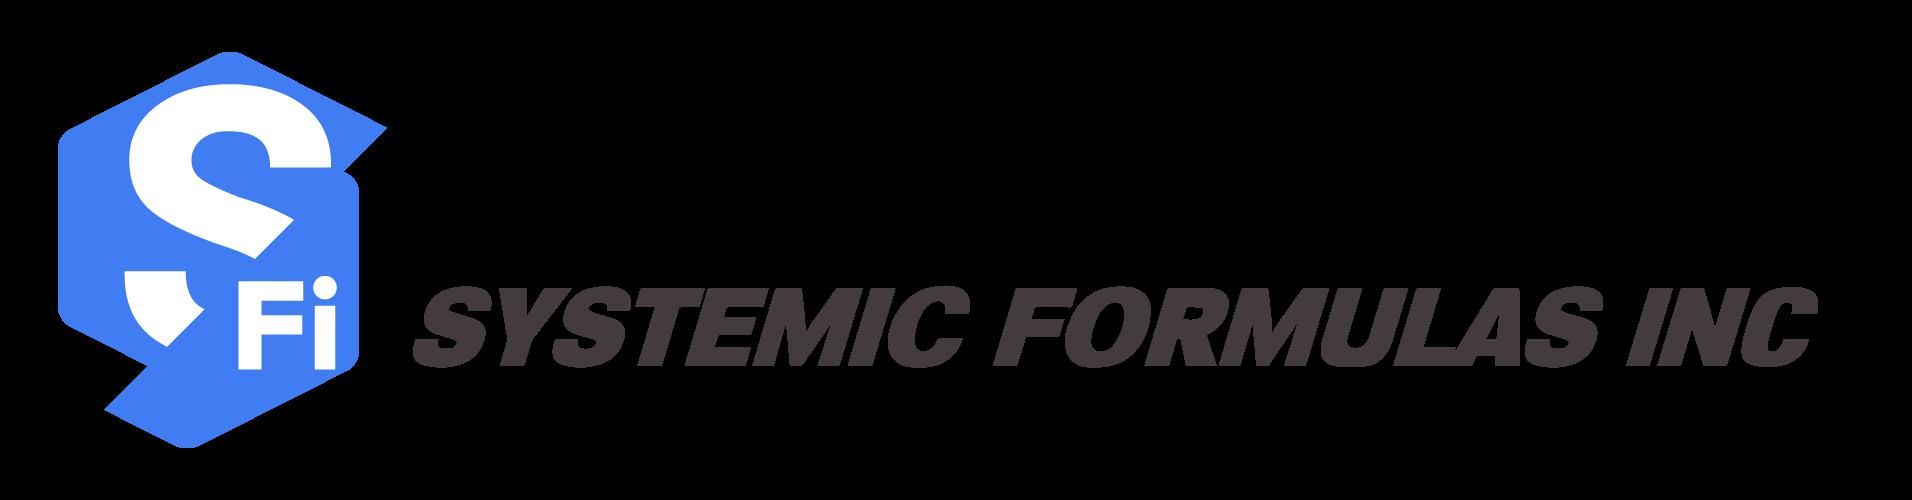 Systemic Formulas